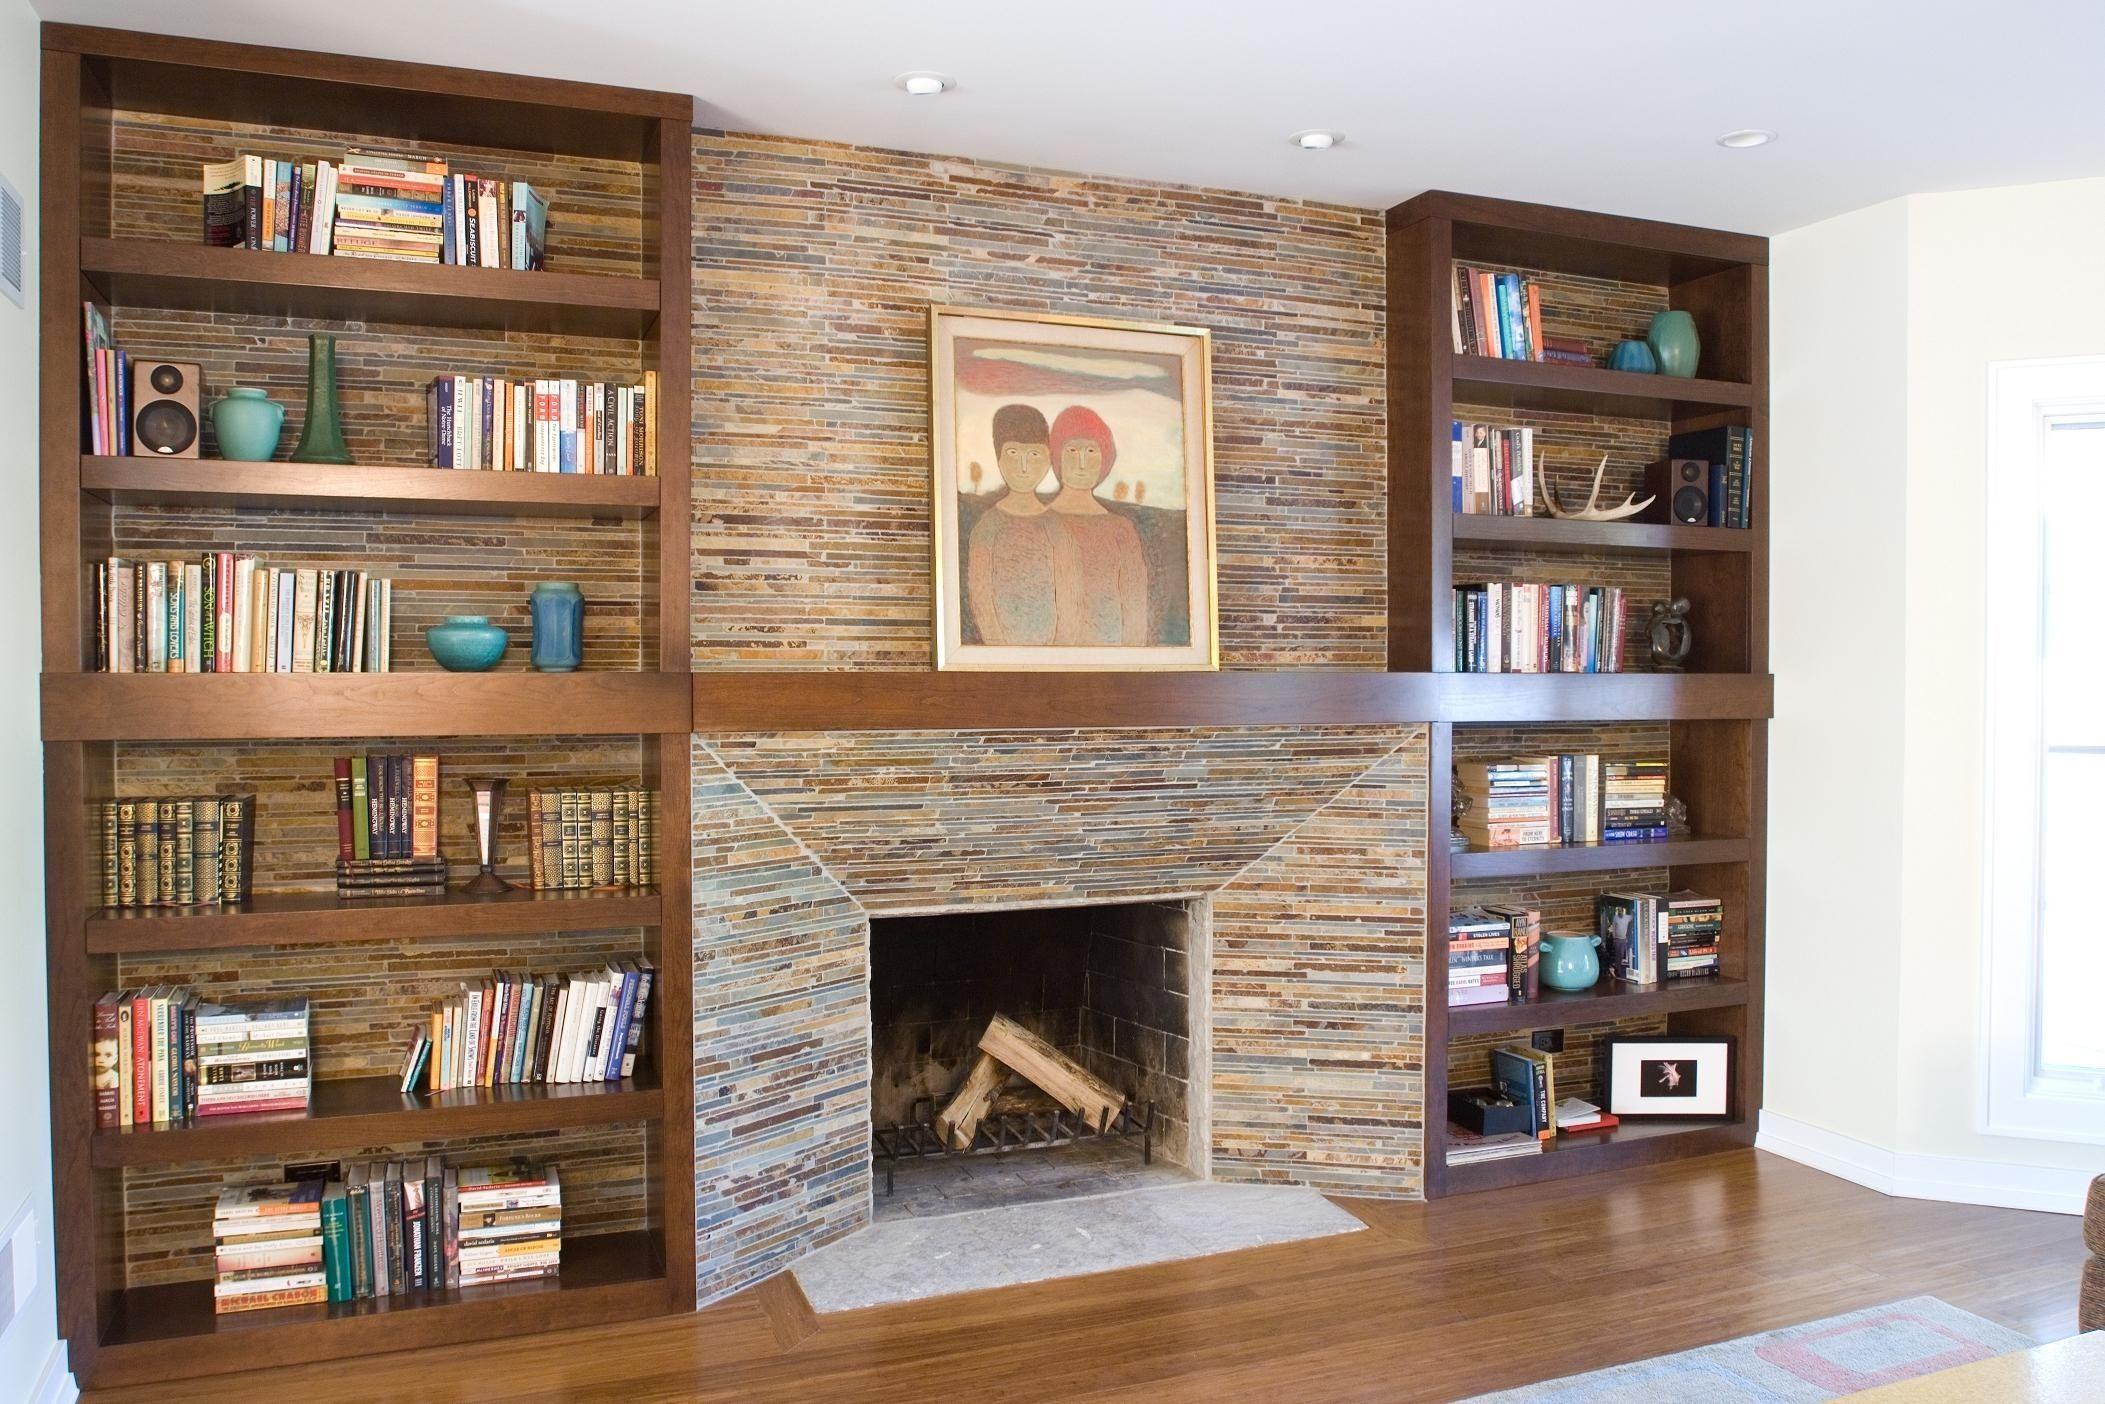 size x plans diy download bookshelves amazing of decor shelves large decorators ceiling free home to photo floor